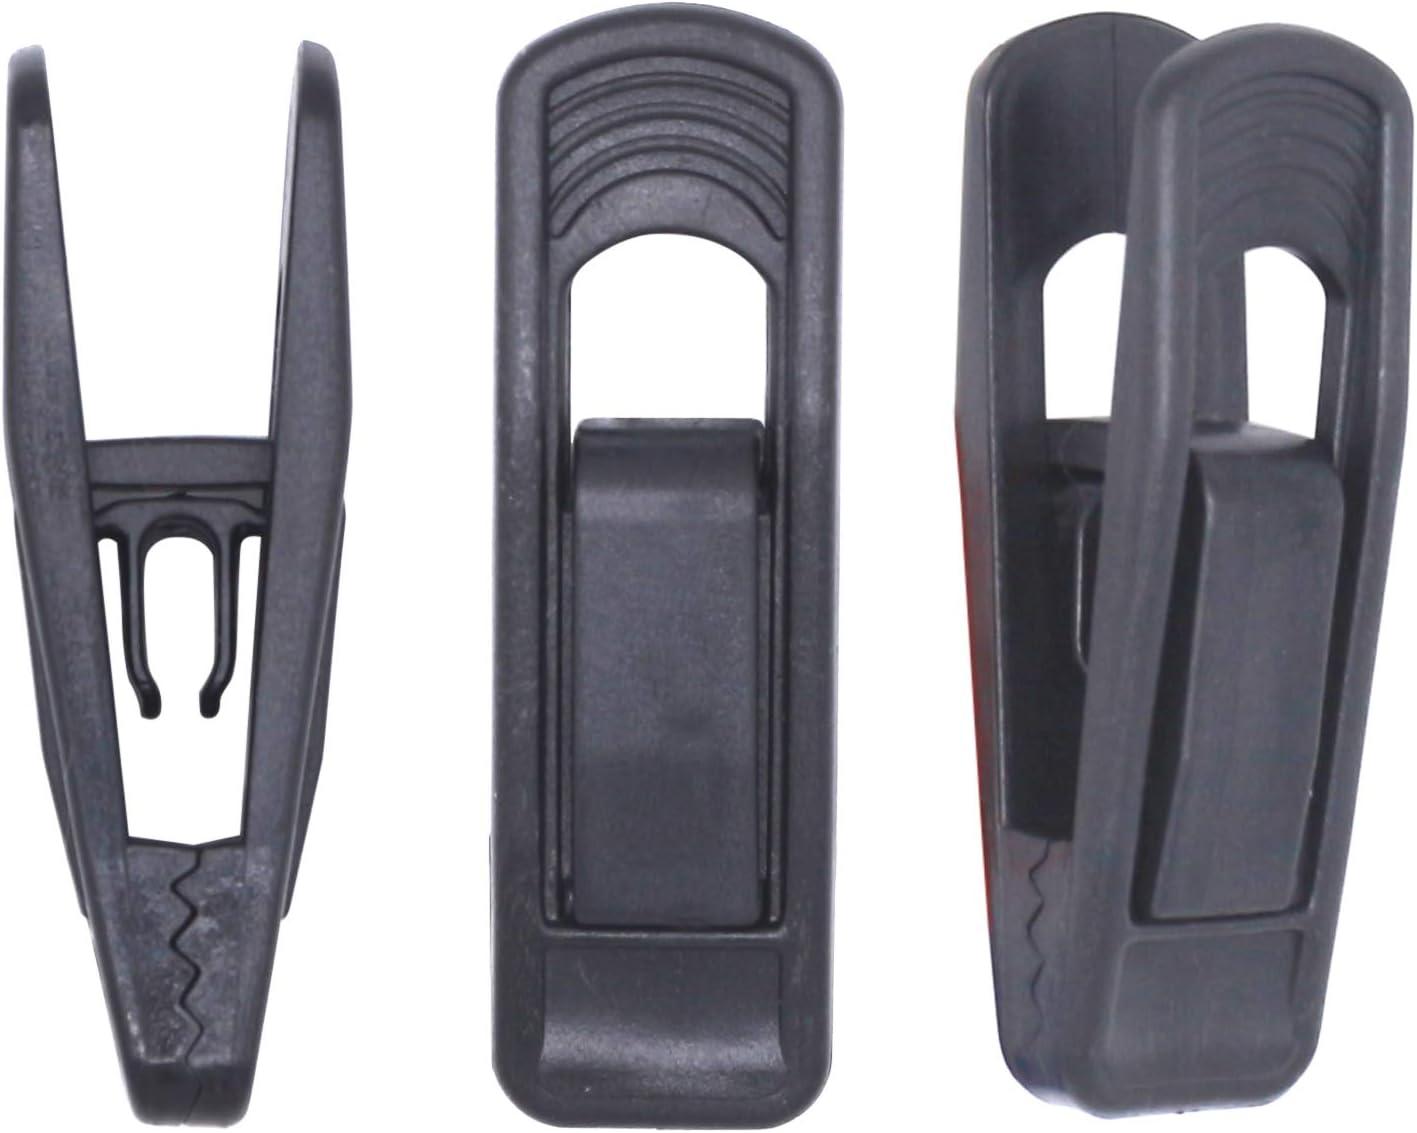 Tinfol Black Plastic Hanger Clips for Hangers, 40 Pack Pants Hanger Clips, Strong Pinch Grip Clips for Use with Slim-line Clothes Hangers, Finger Clips for Velvet Hangers